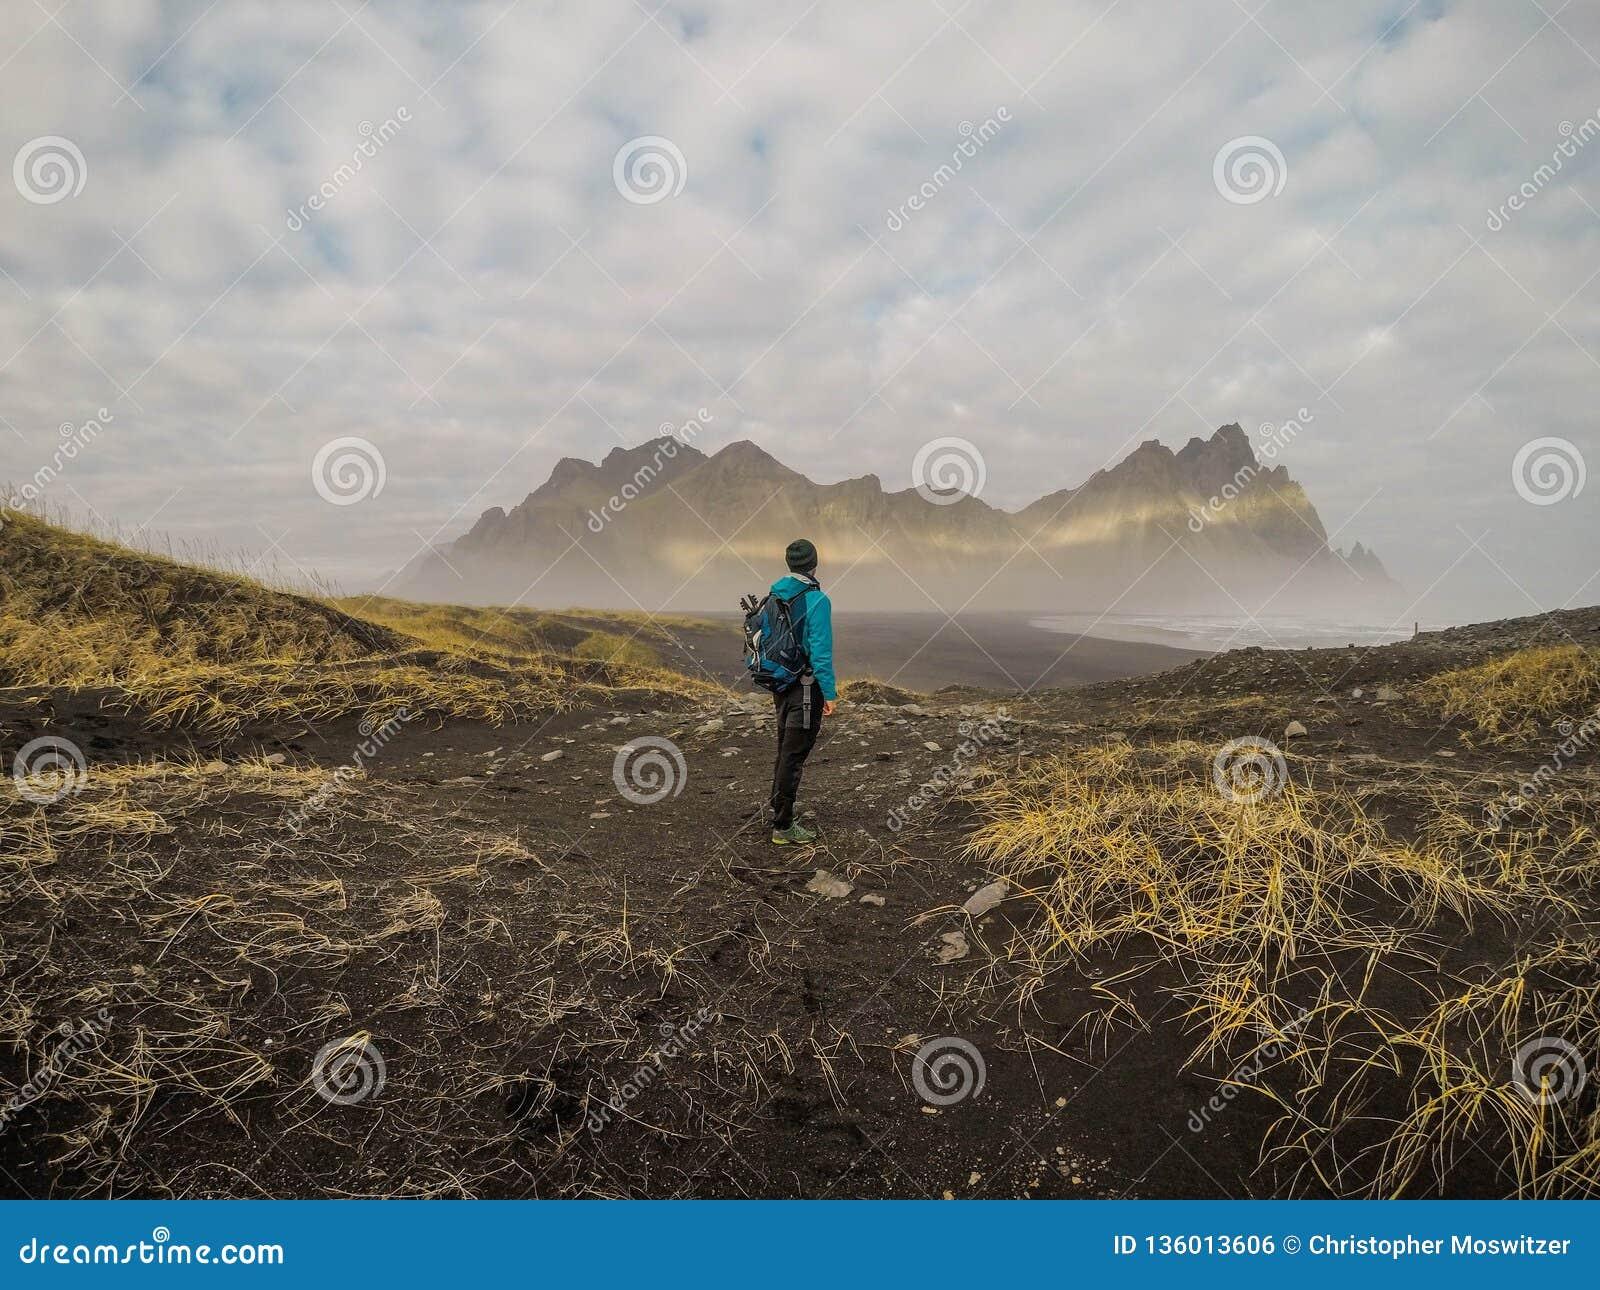 Islândia - Viking Man e montanhas pontudo